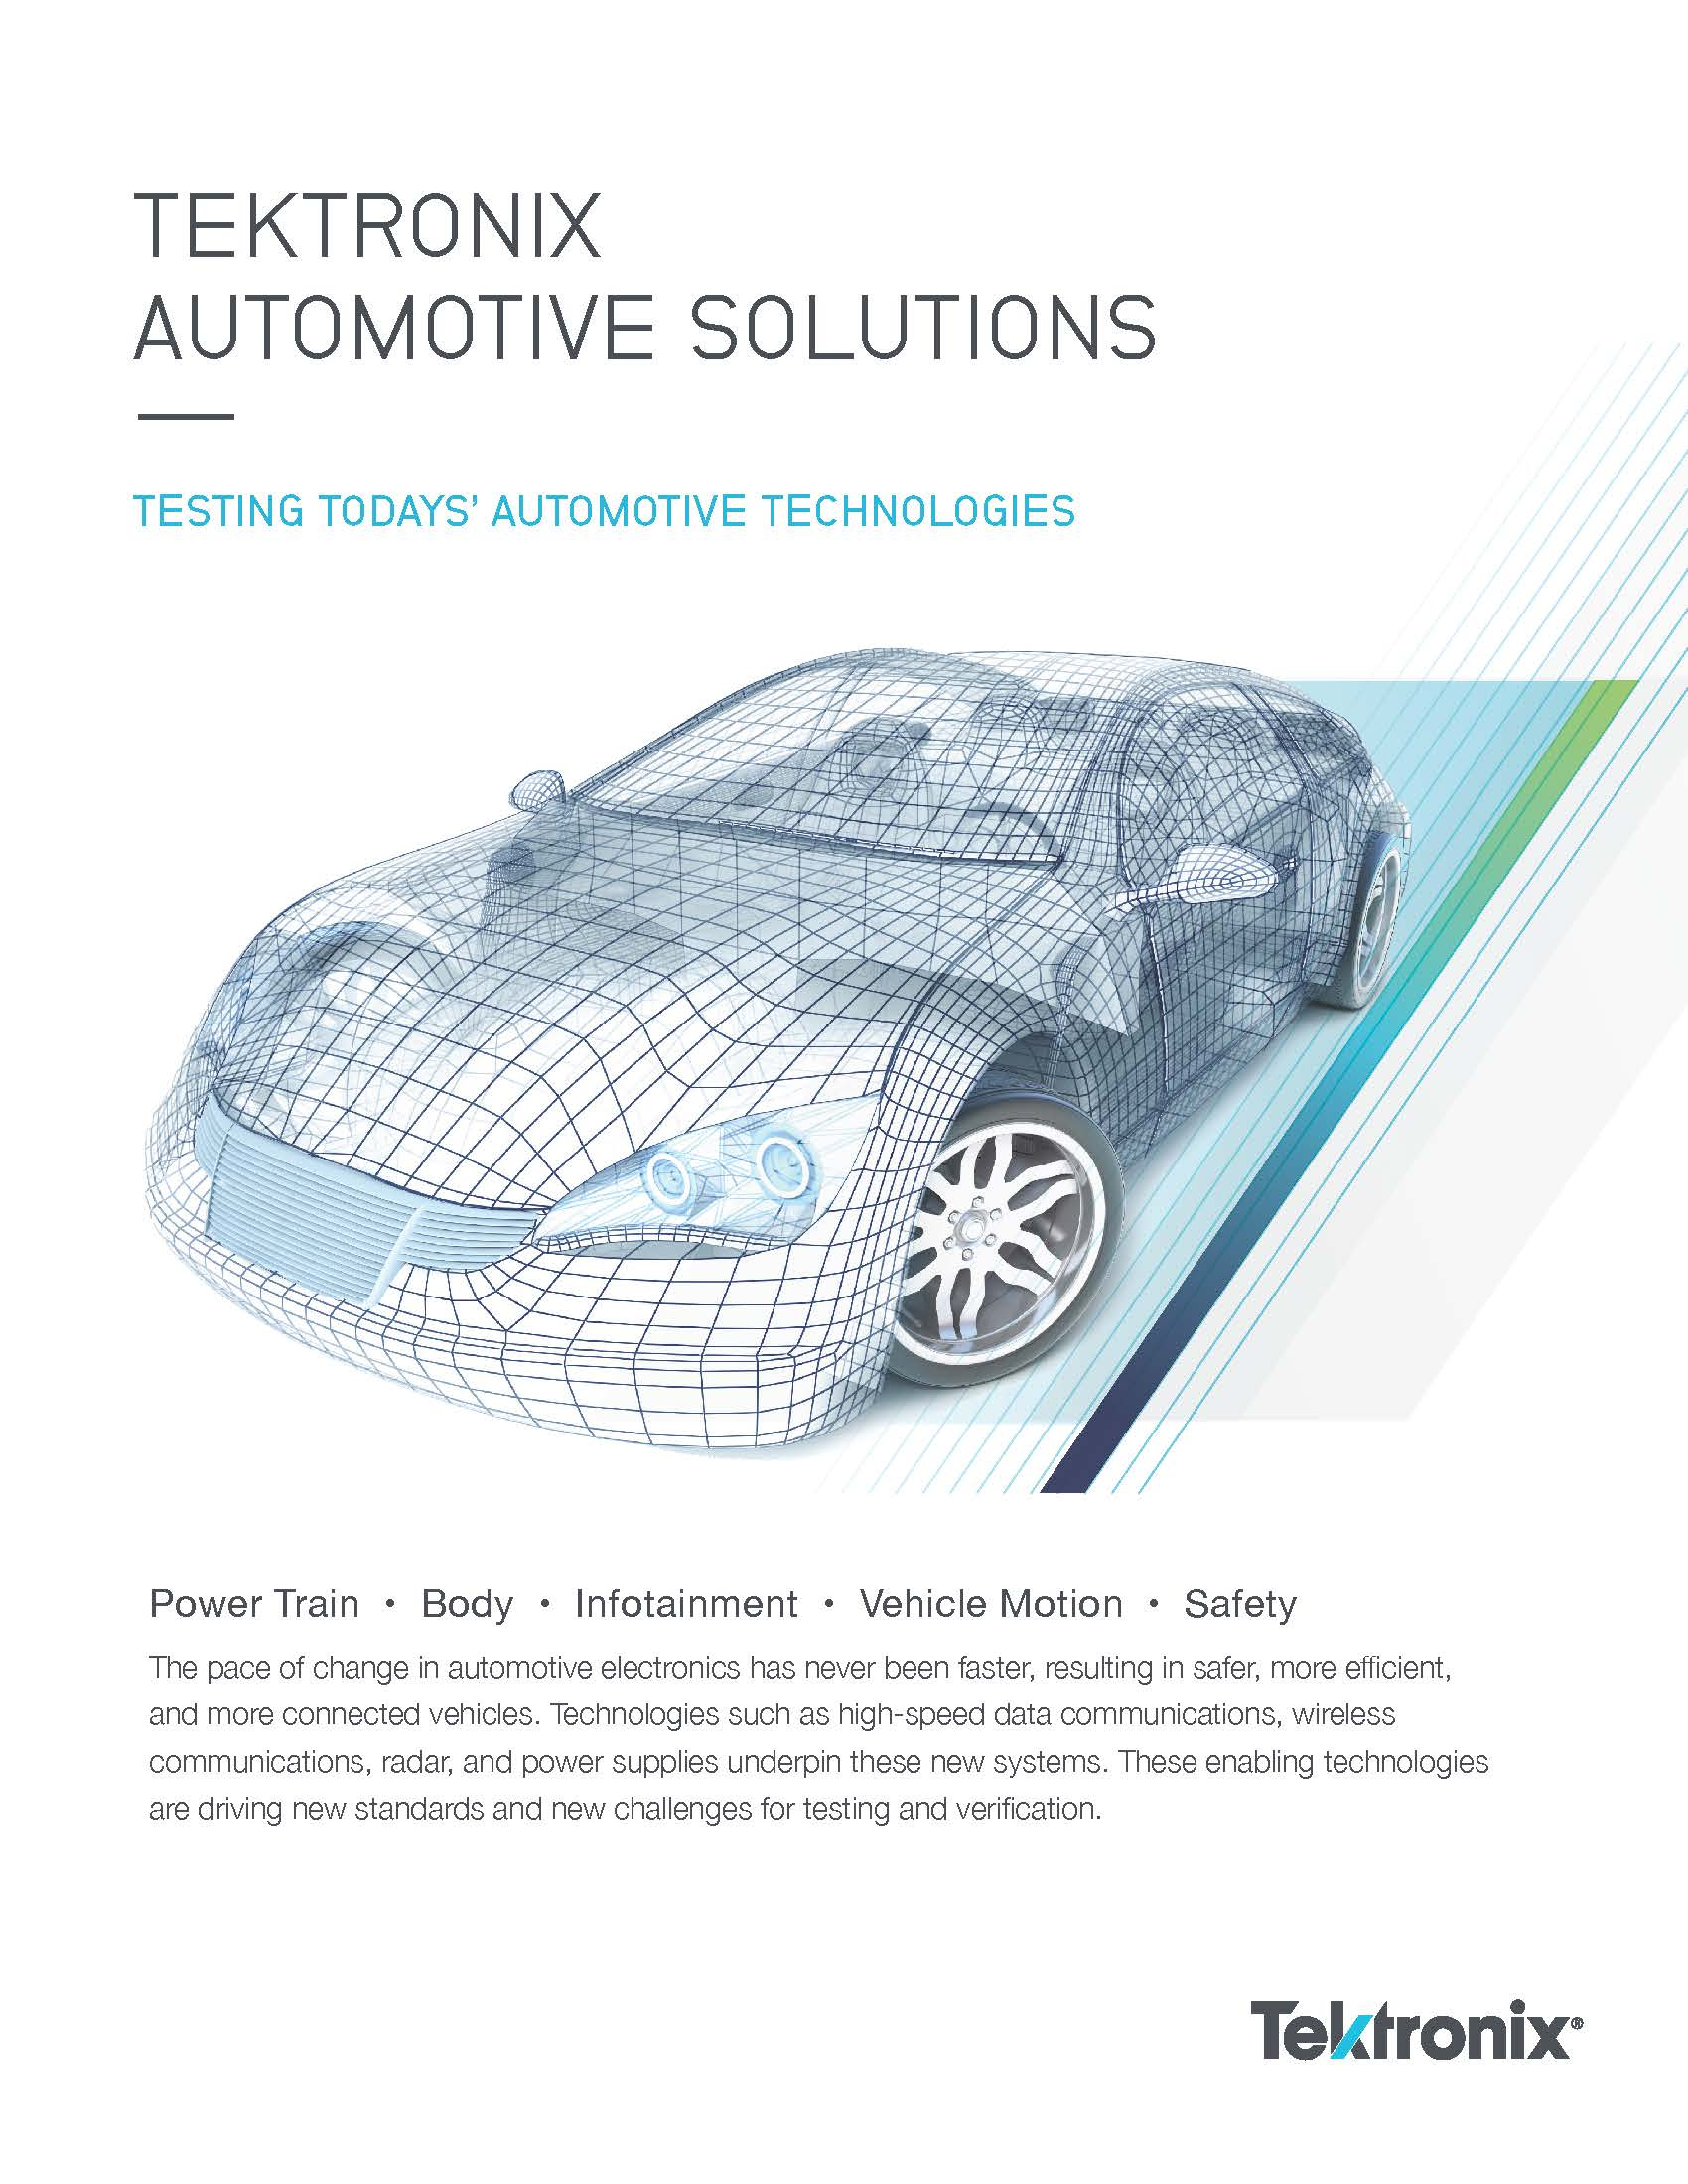 45W_60646_1_Brochure_Automotive_Solutions